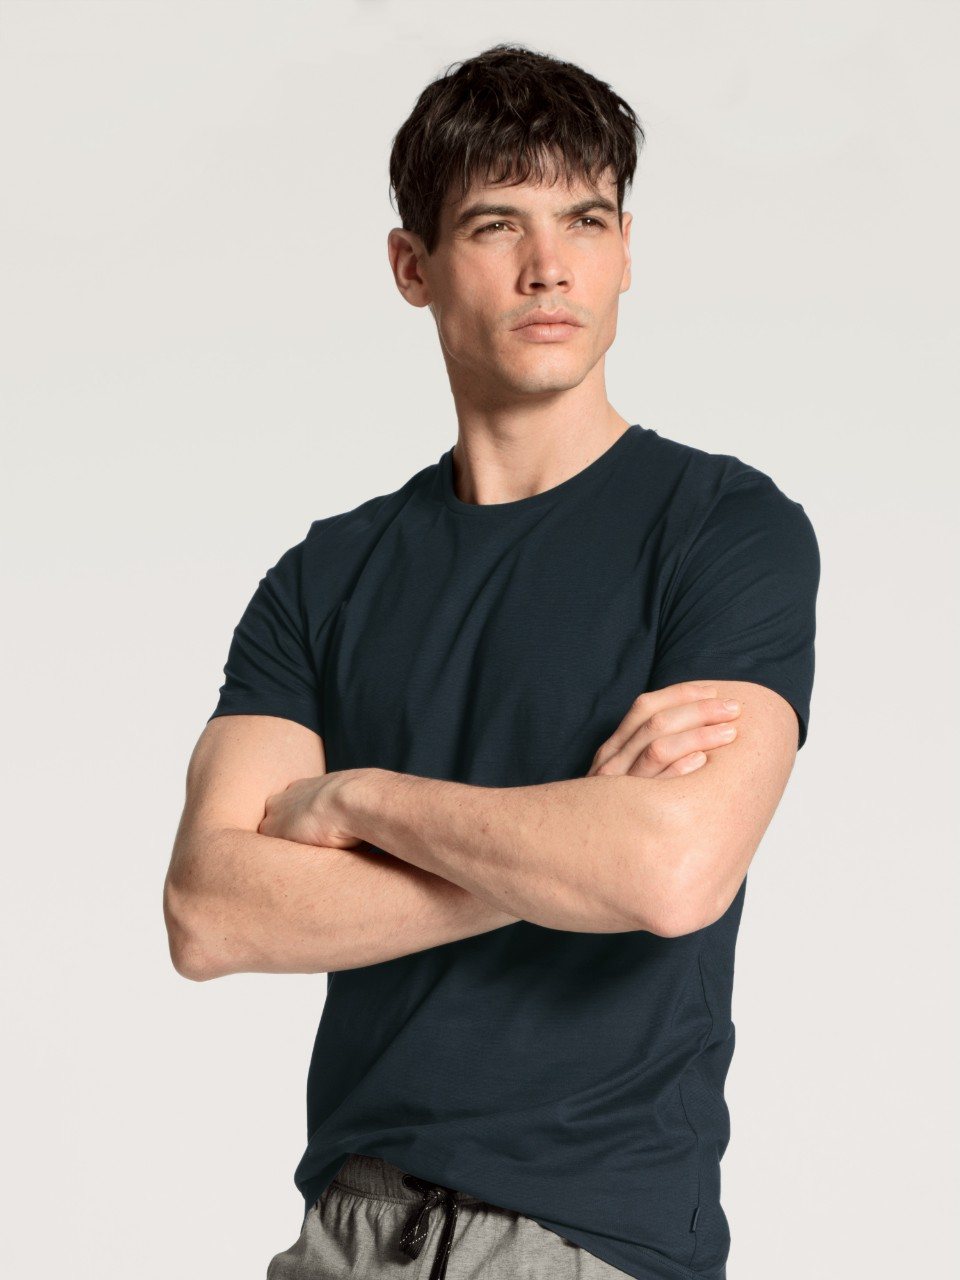 14081 479 tee-shirt marine 100% coton jersey Prix : 34.95 €